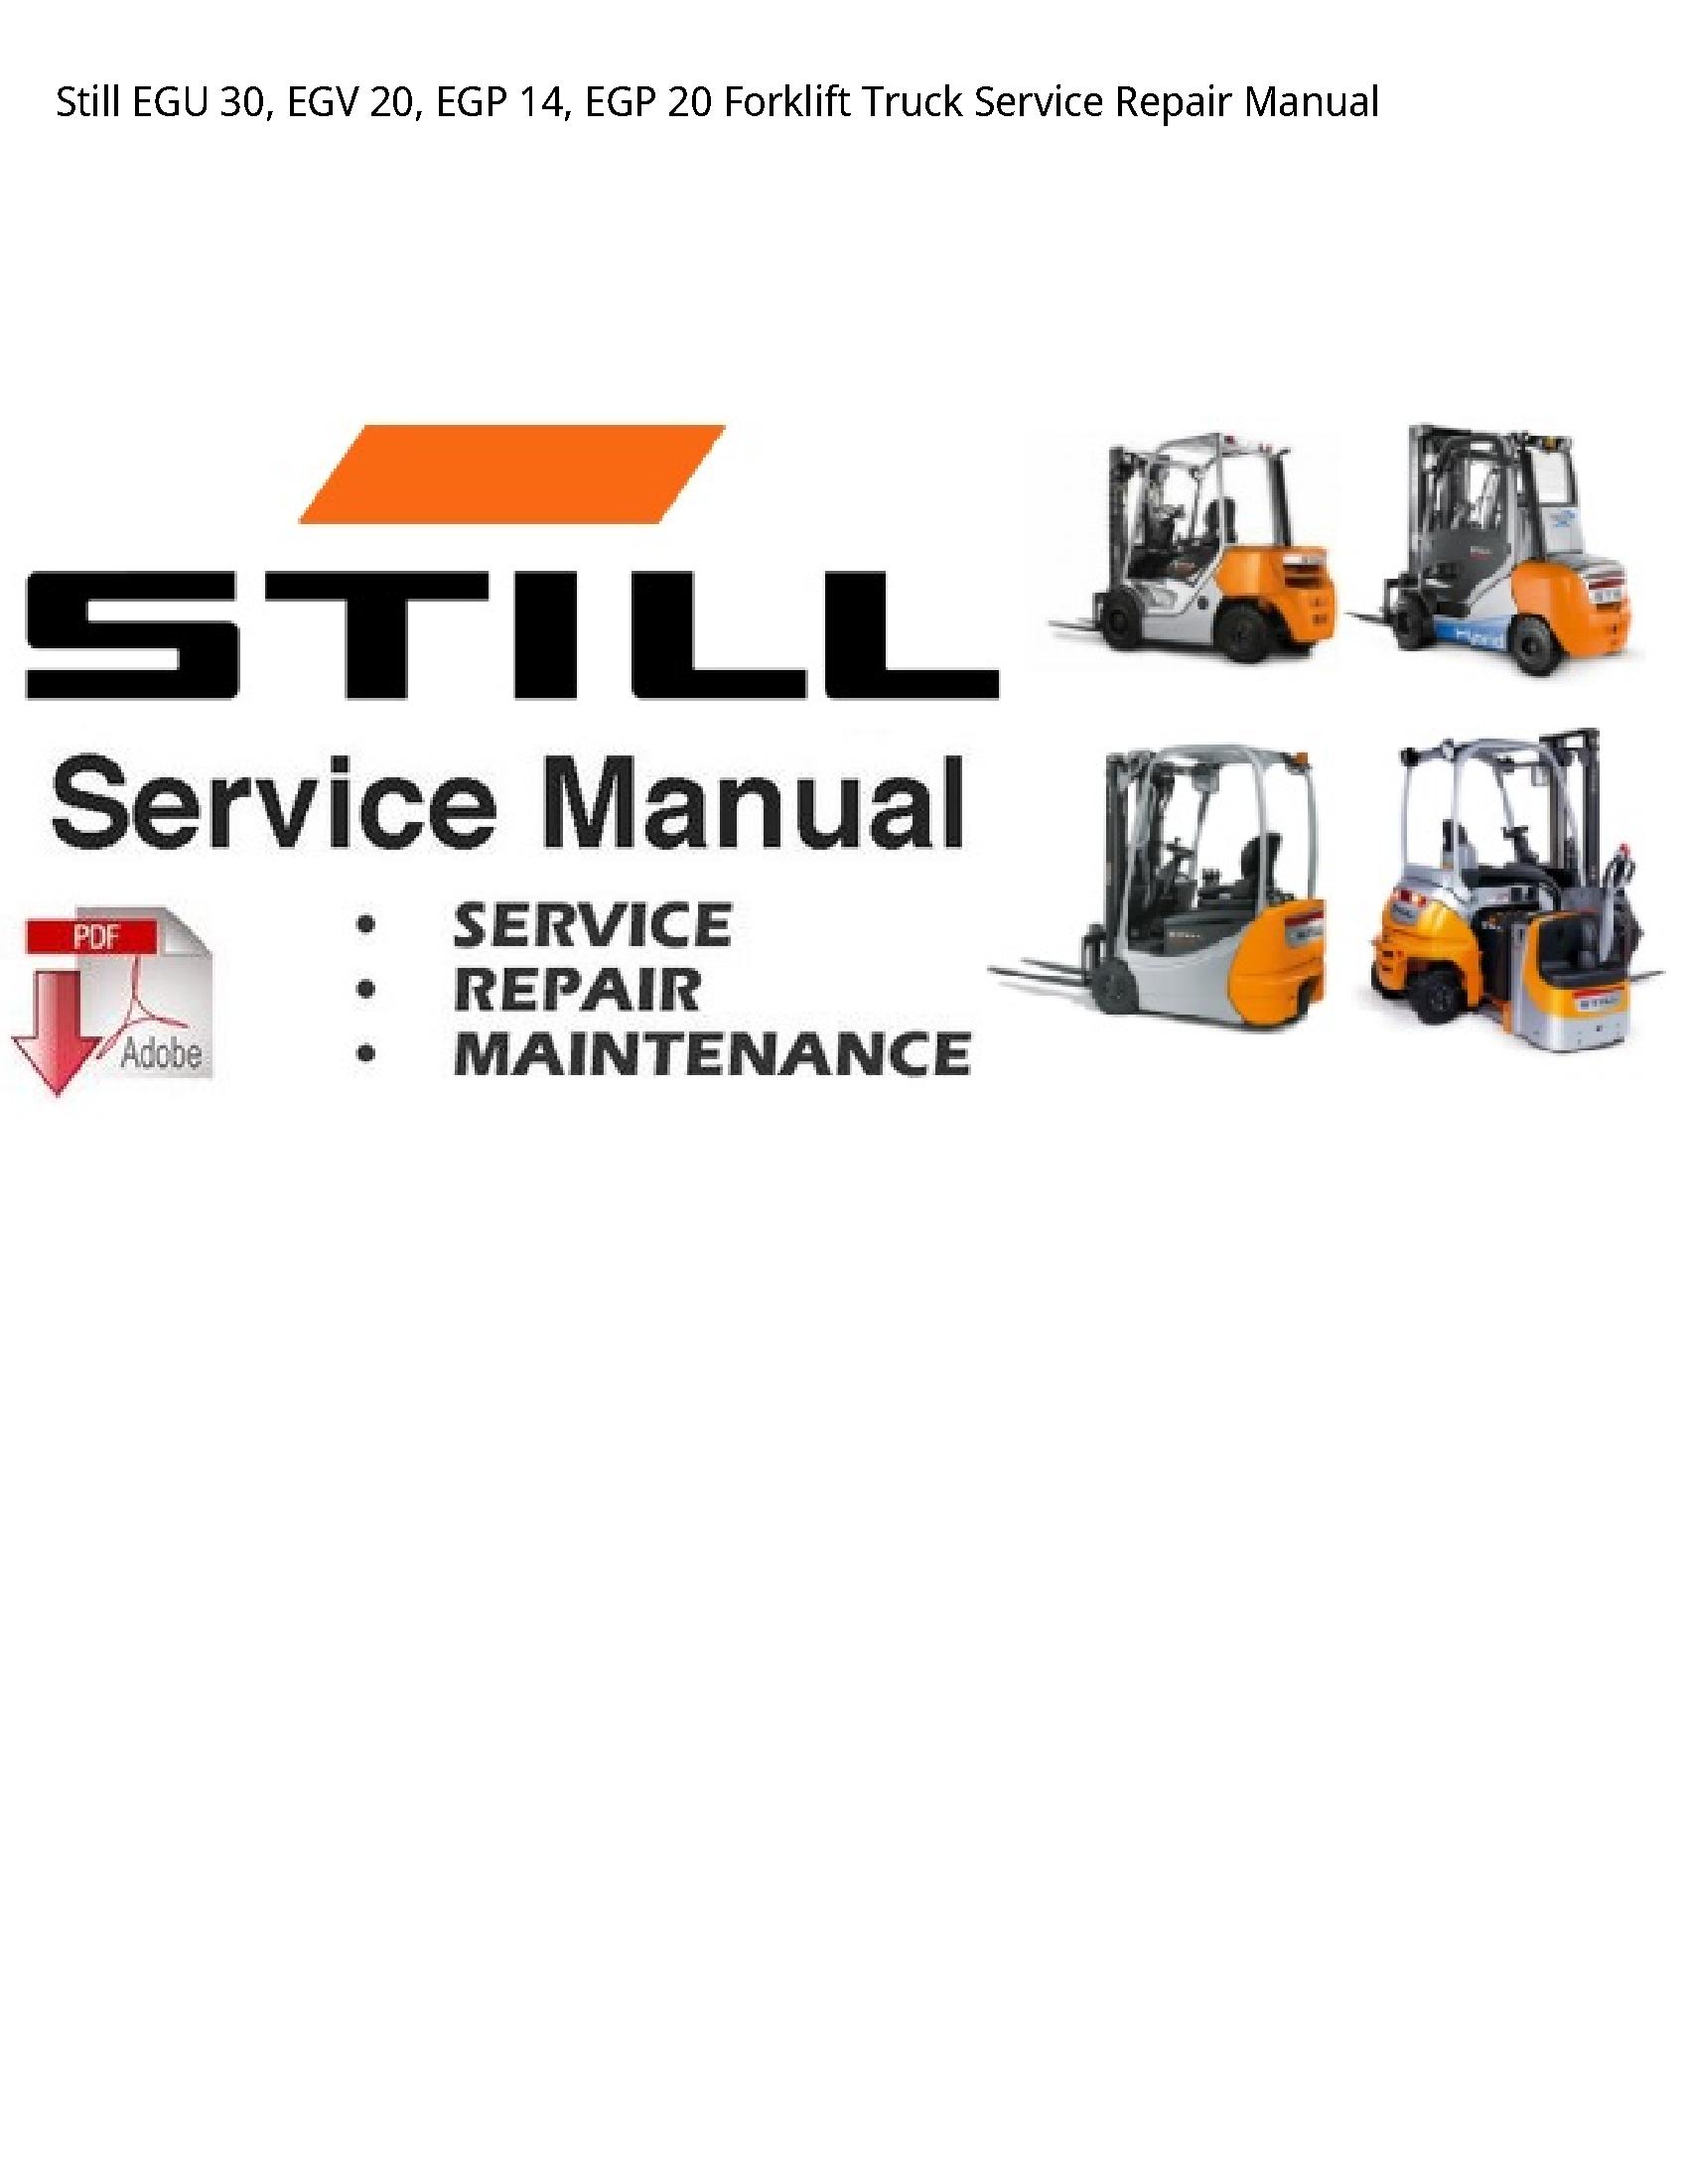 Still 30 EGU EGV EGP EGP Forklift Truck manual